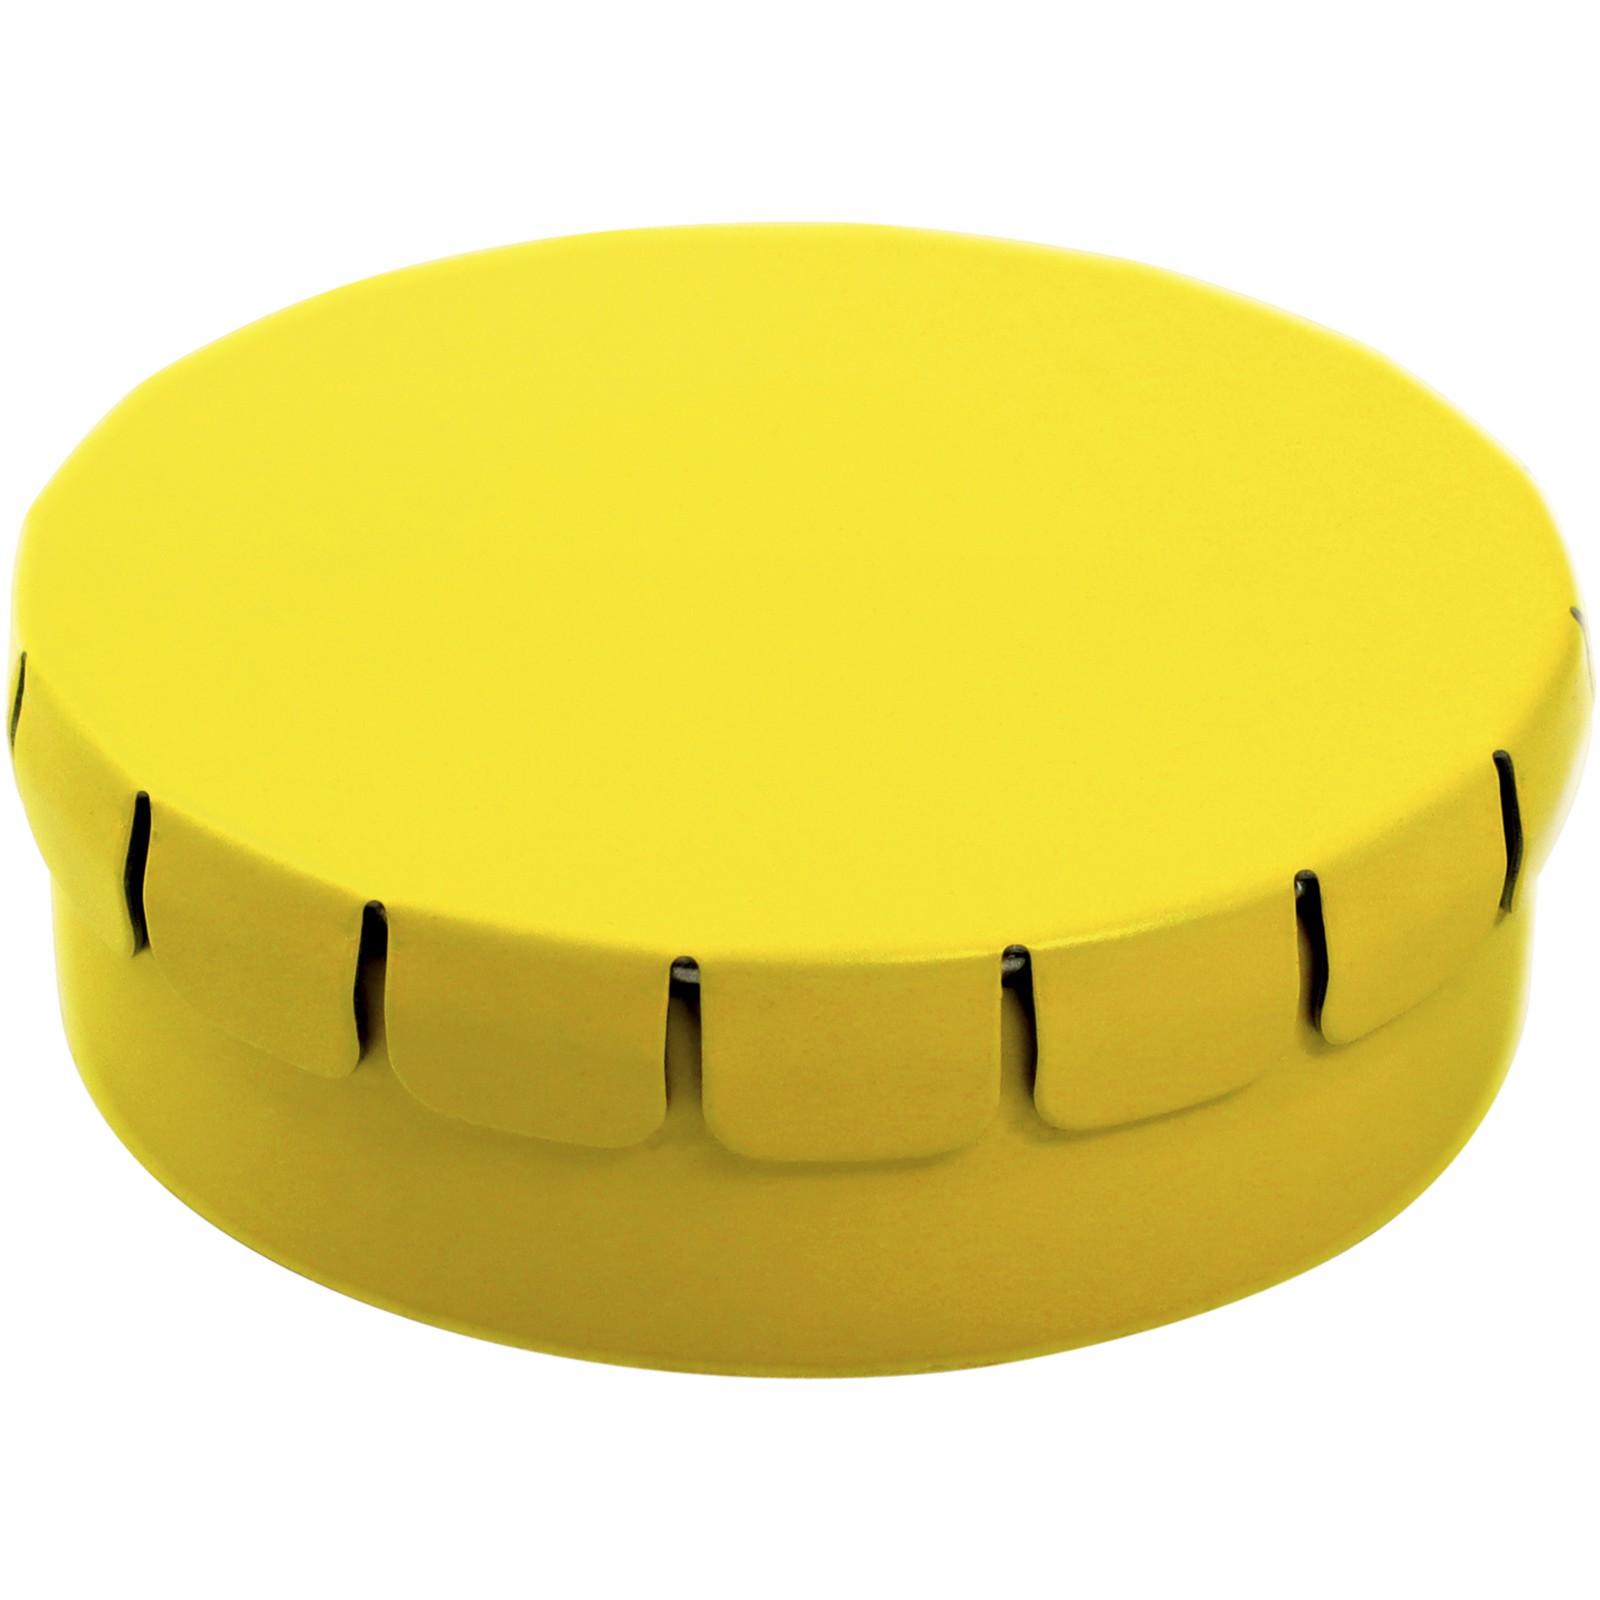 Clic clac mentolky bez cukru - Žlutá